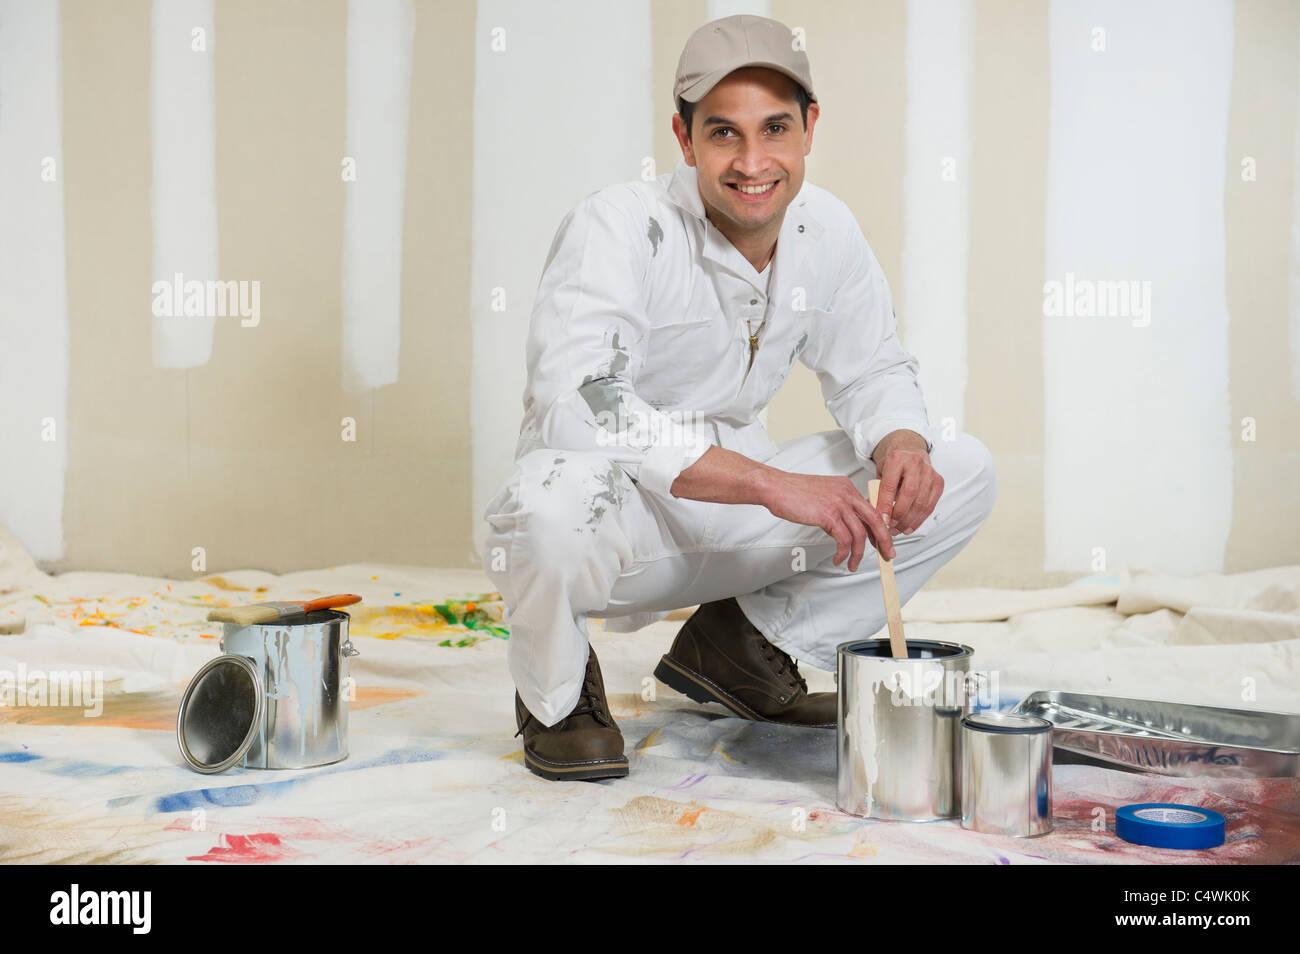 USA,New Jersey,Jersey City,house painter stirring paint - Stock Image